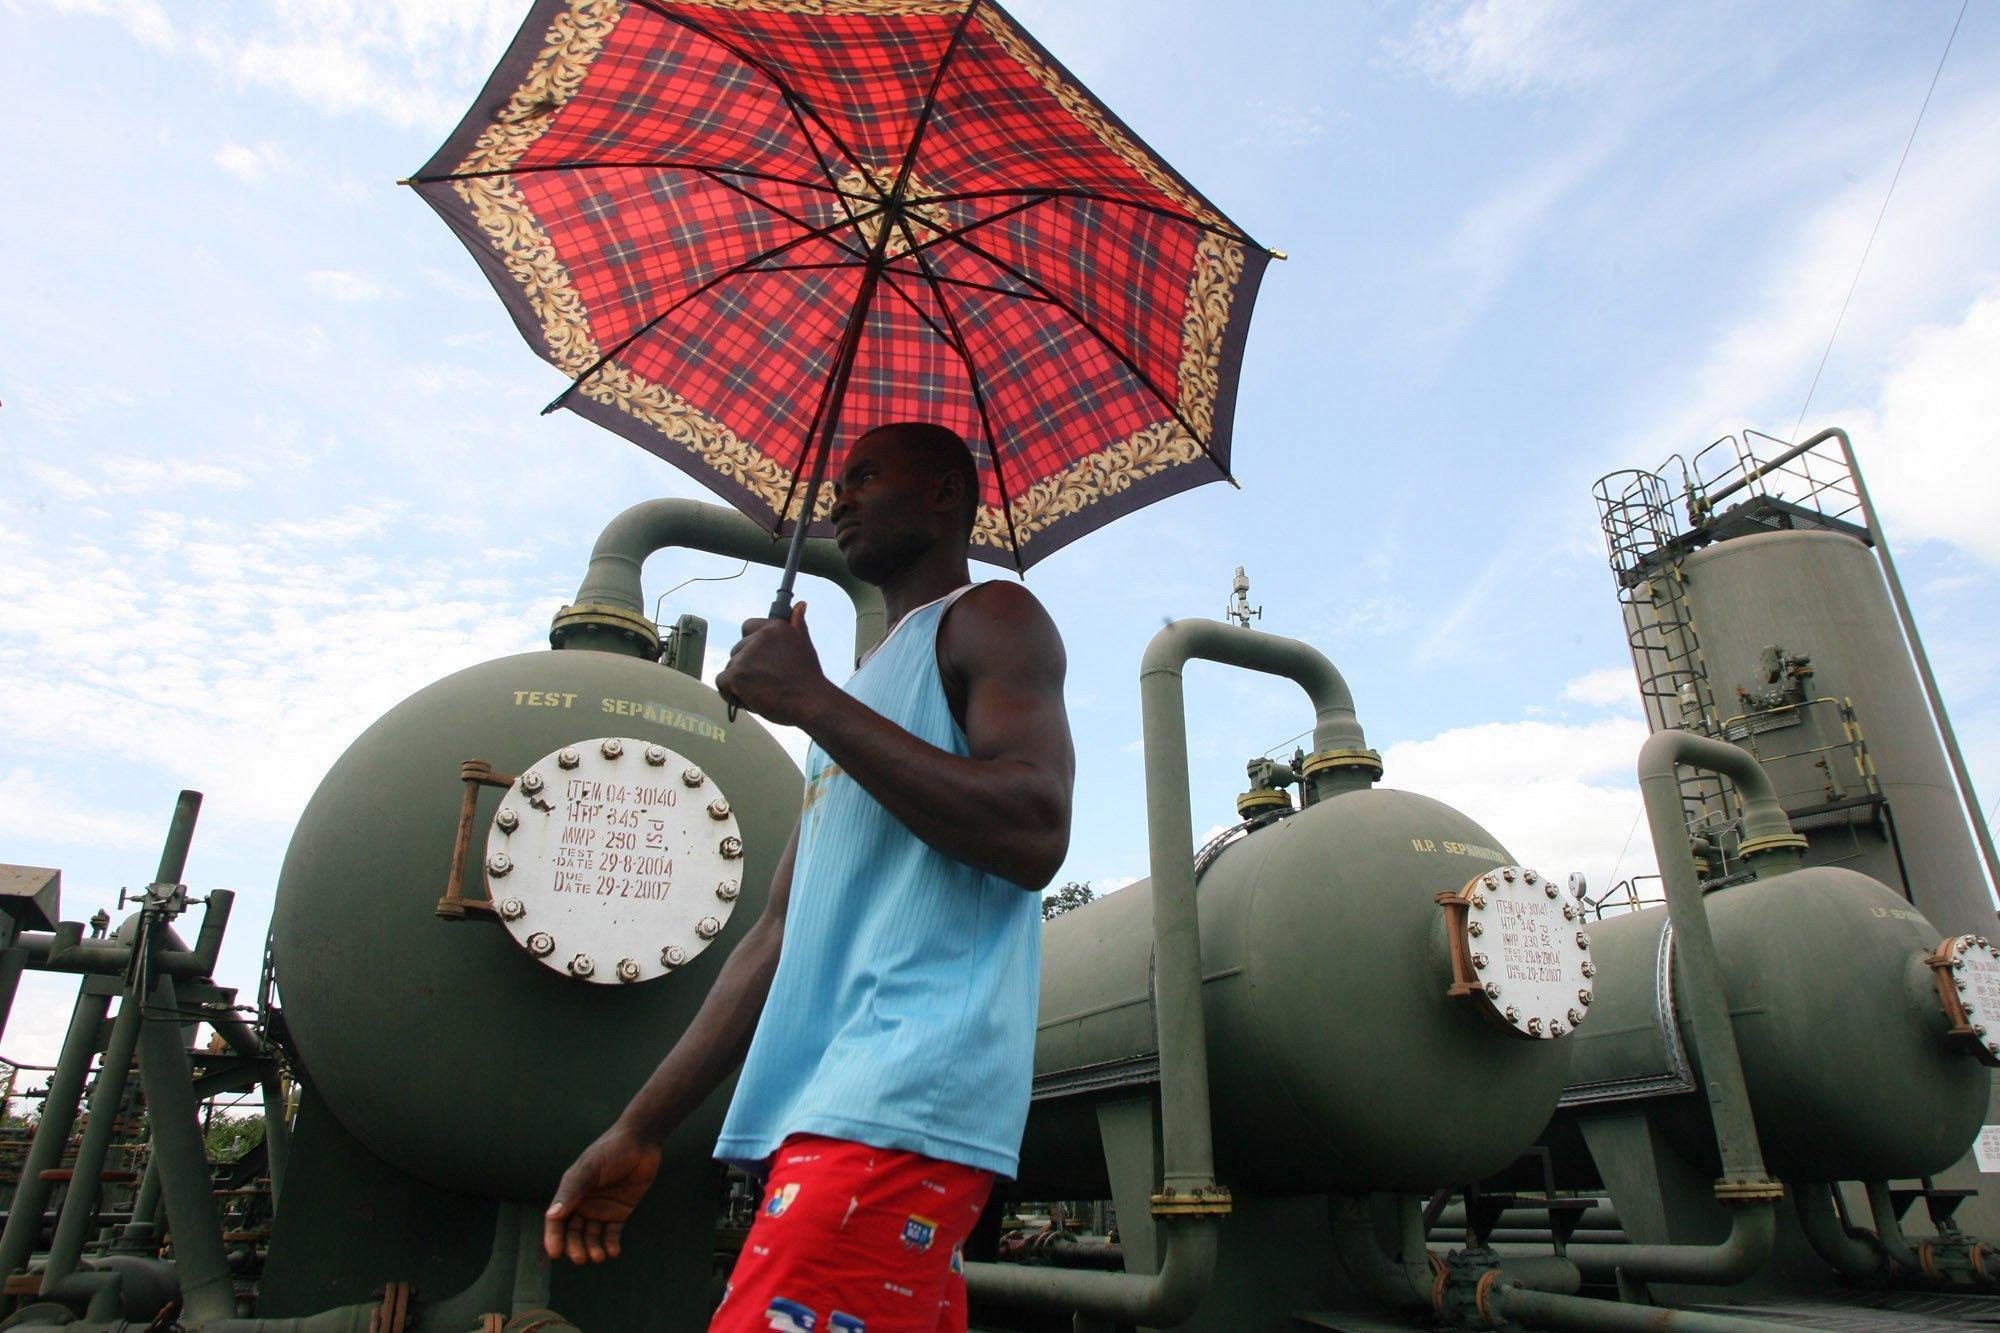 APNewsBreak: Nigeria sues over $12B in 'illegal' oil exports